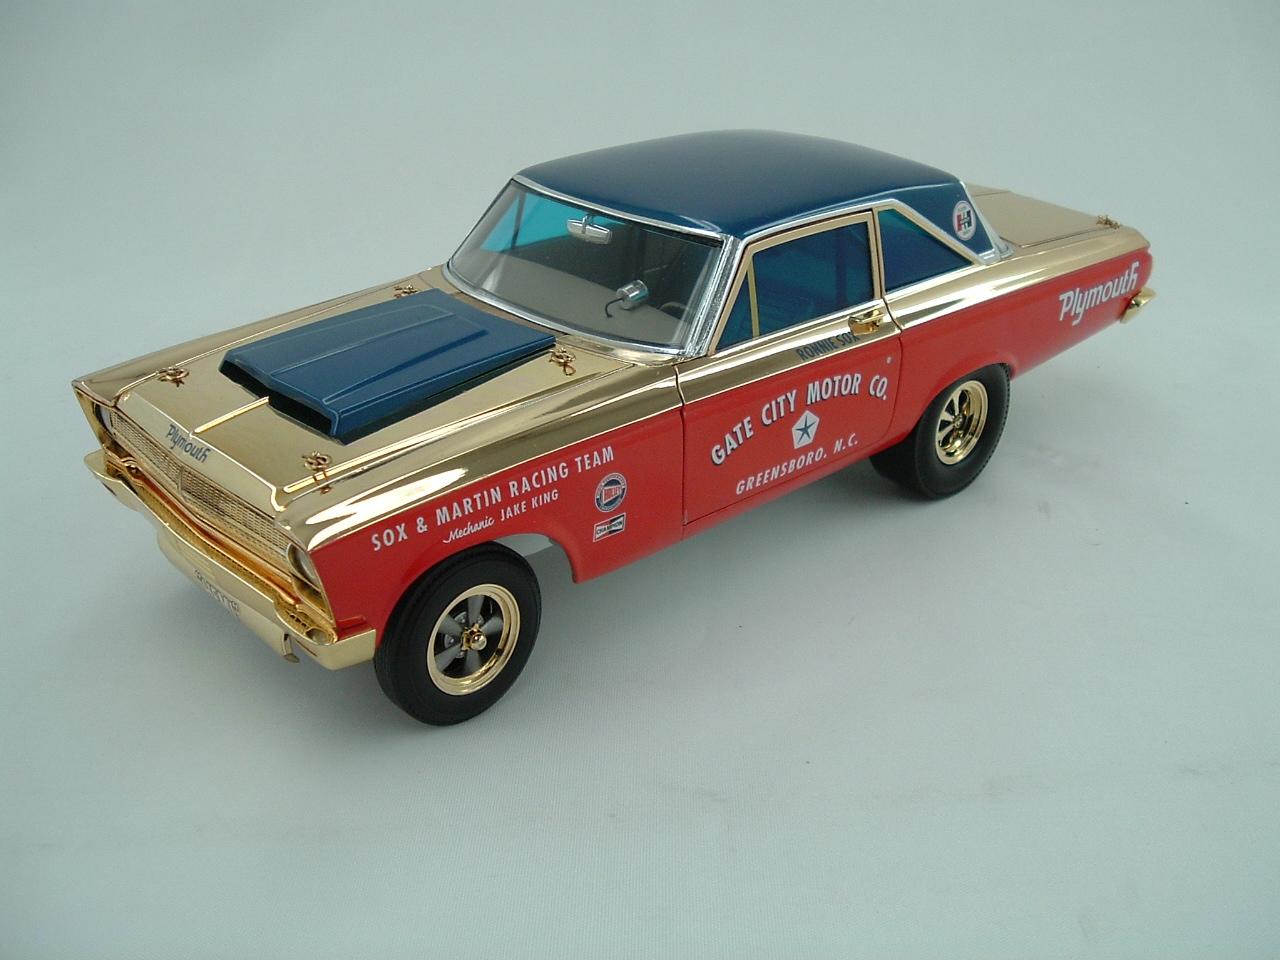 Supercar Collectibles Ultra Rare GOLD Plated Sox & Martin '65 Plymouth